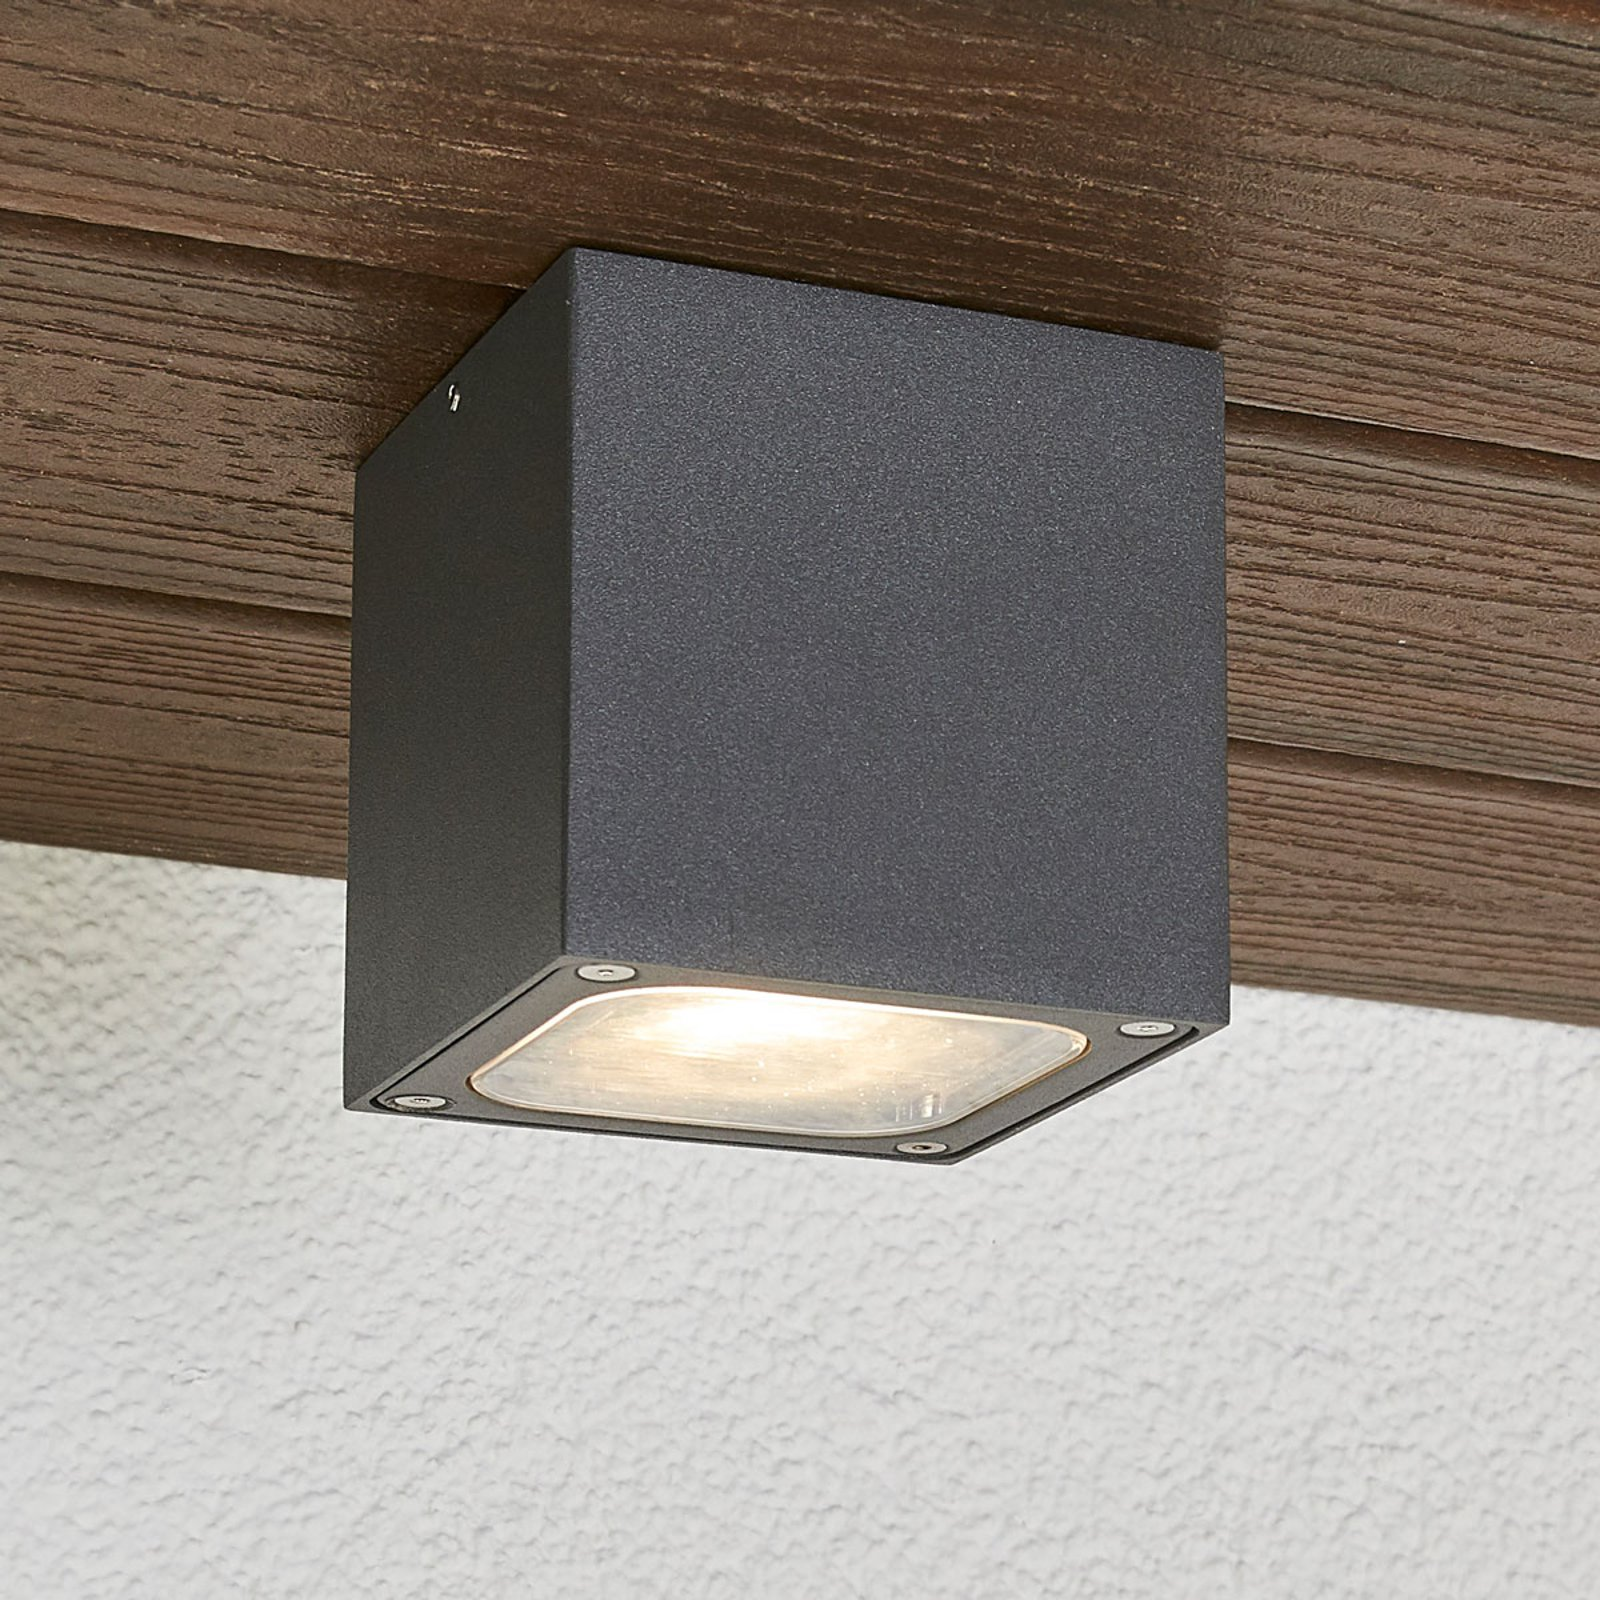 Terningformet LED-utetaklampe Tanea, IP54